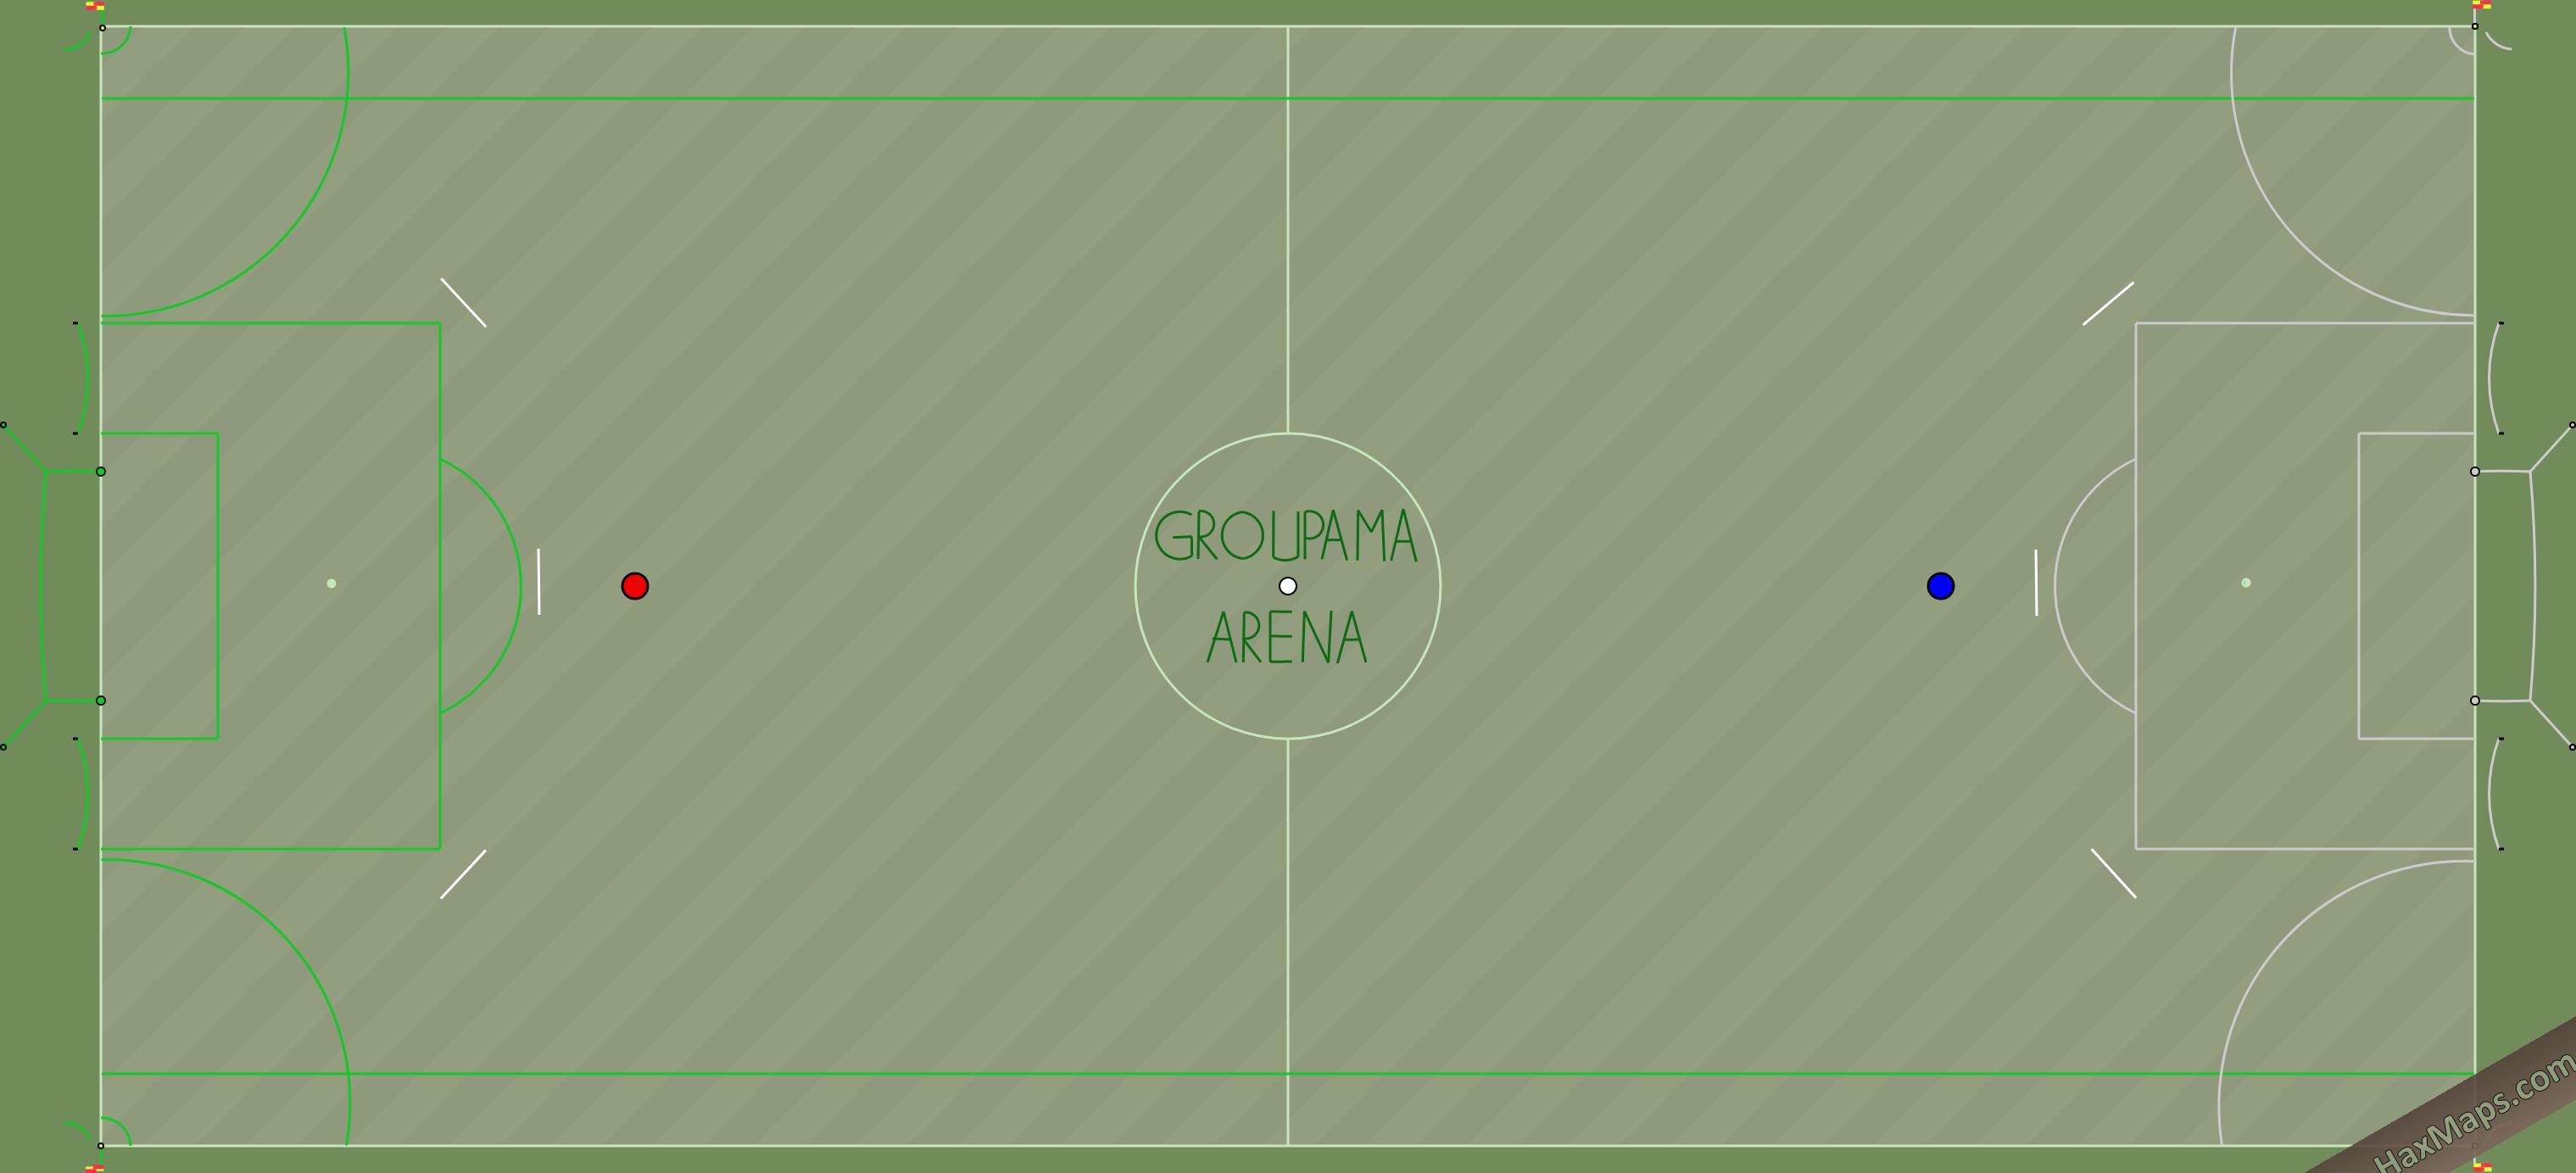 hax ball maps | GROUPAMA ARENA